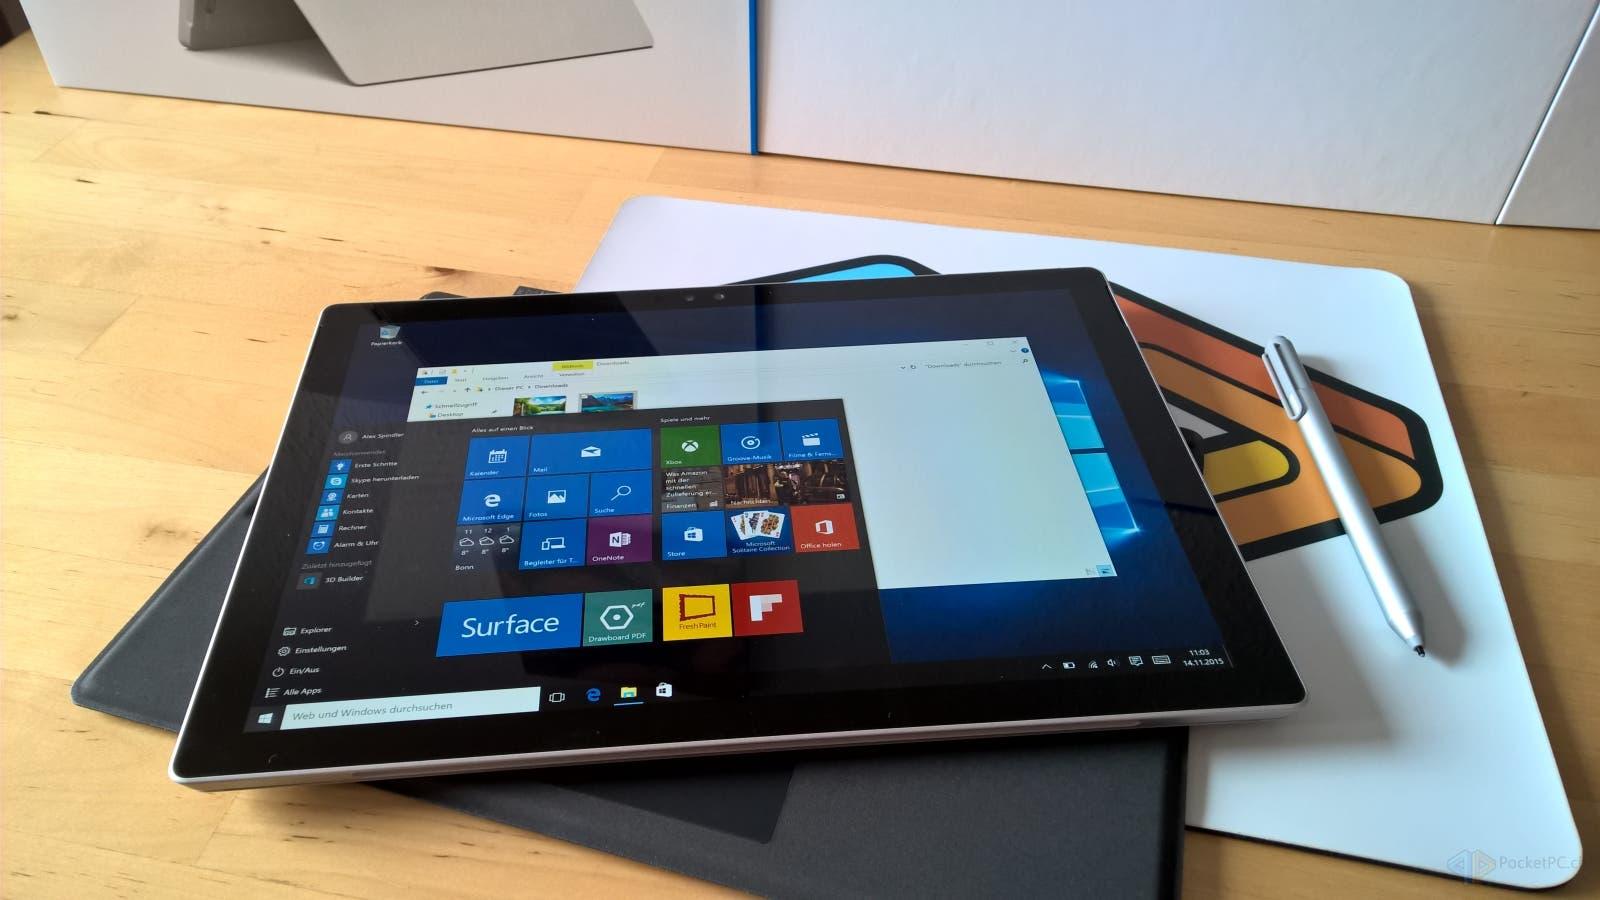 WP_20151114_11_03_48_Pro_LI Review: Microsoft Surface Pro 4 im Test